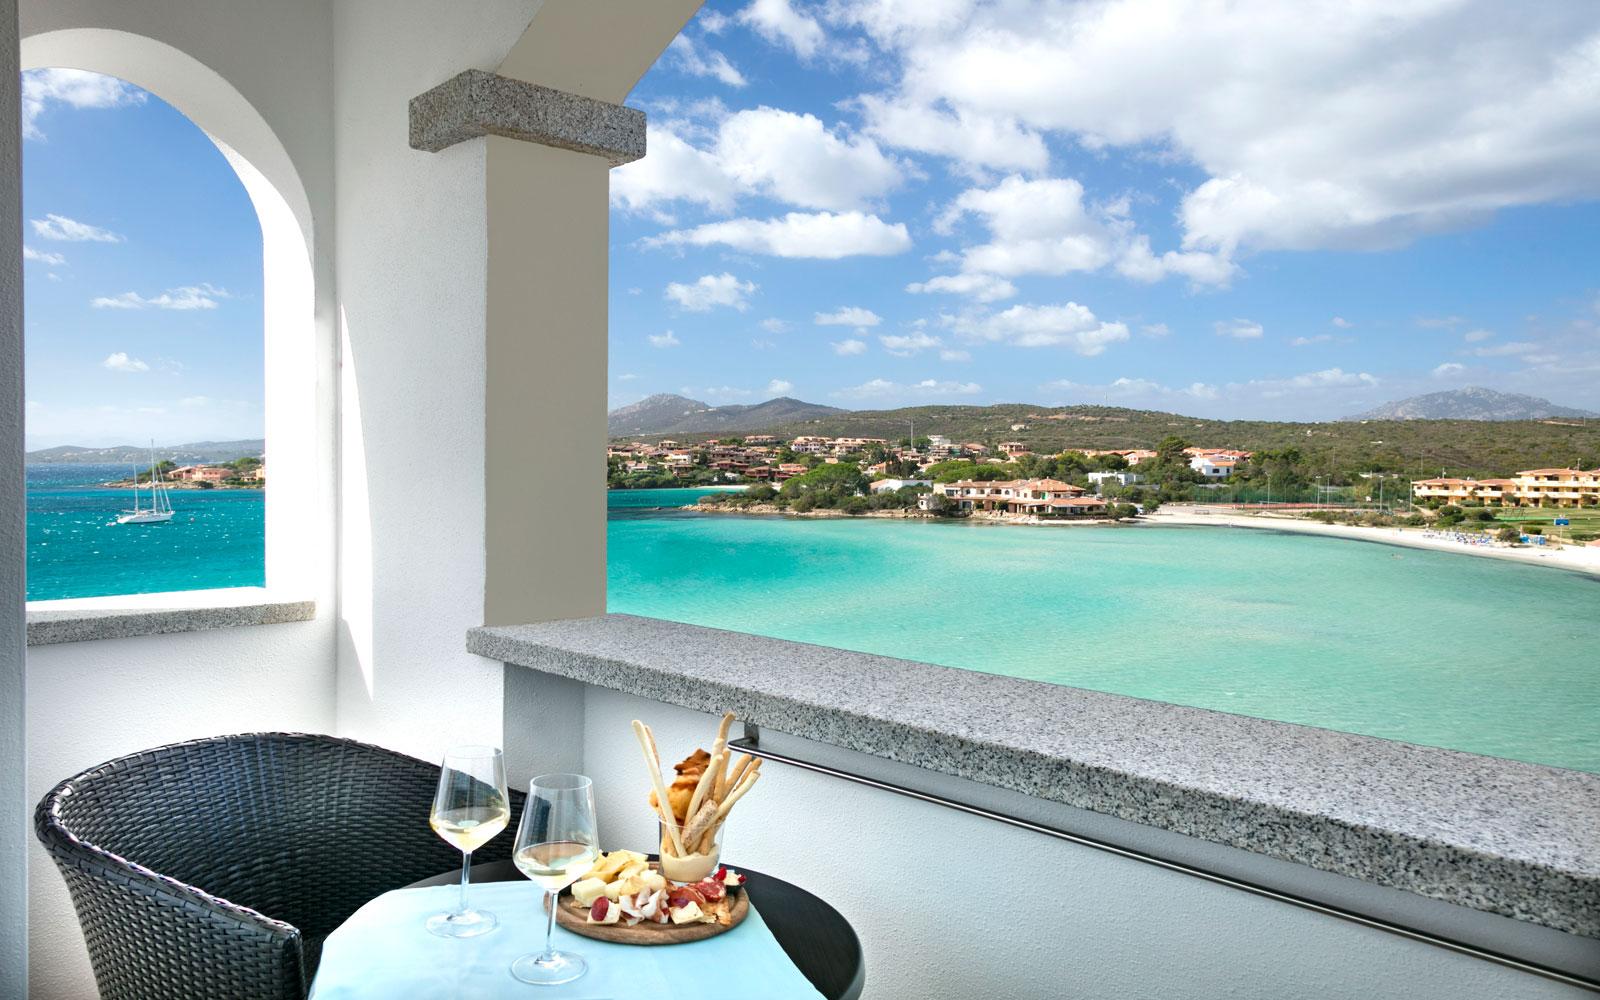 Superior Room at Gabbiamo Azzurro Hotel & Suites